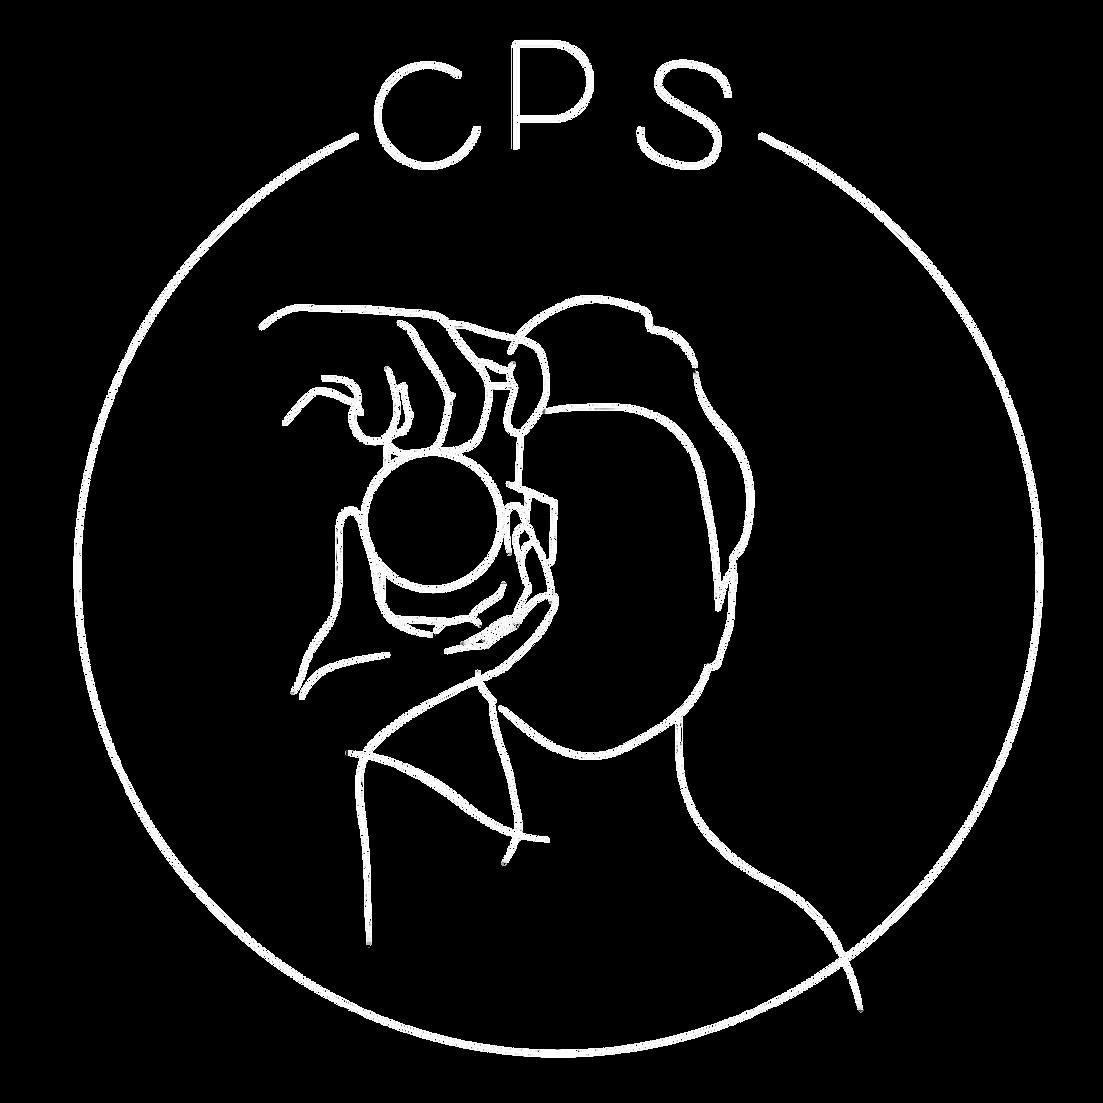 cps black.png